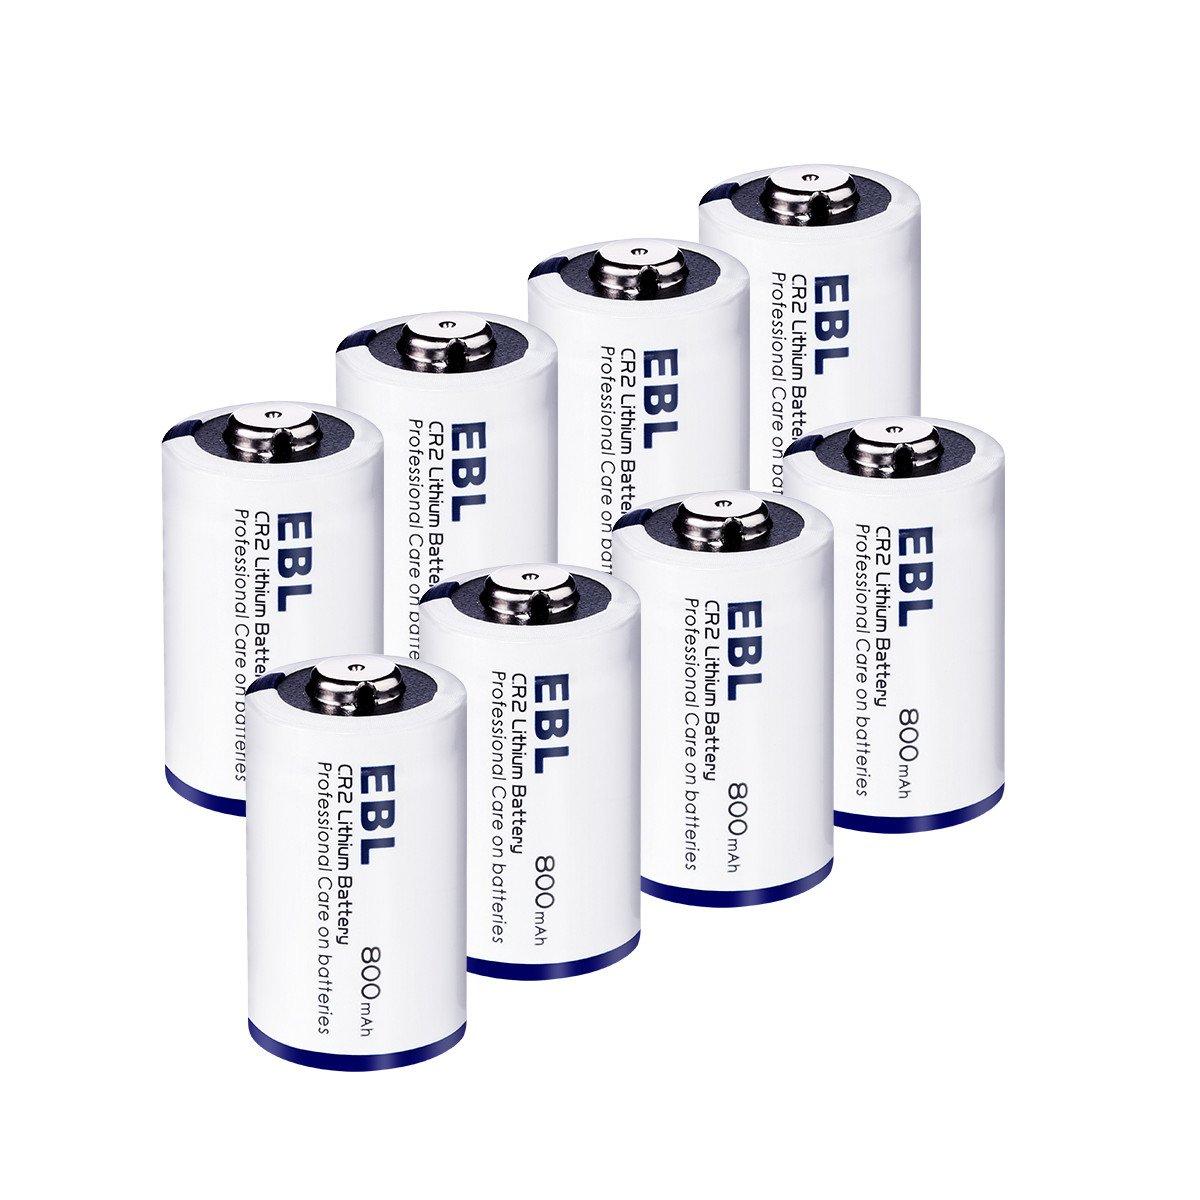 EBL CR02 800maAH batería de lito 3V- para Linterna Cámara Digital Videocámara Juguetes Antorcha